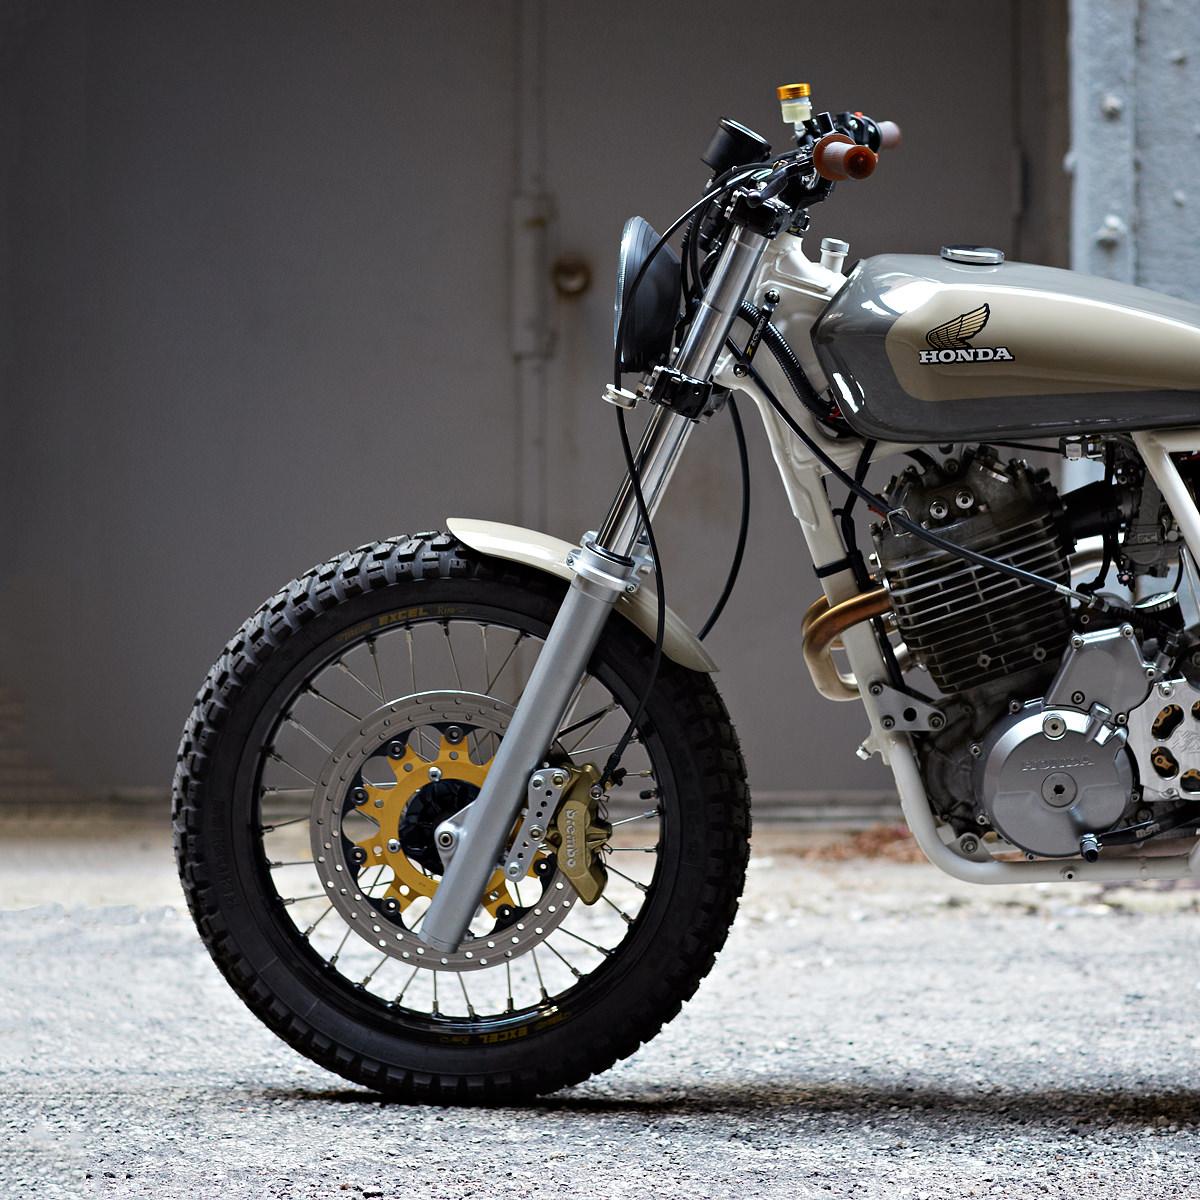 cabin fever: daniel peter's xr650 | bike exif